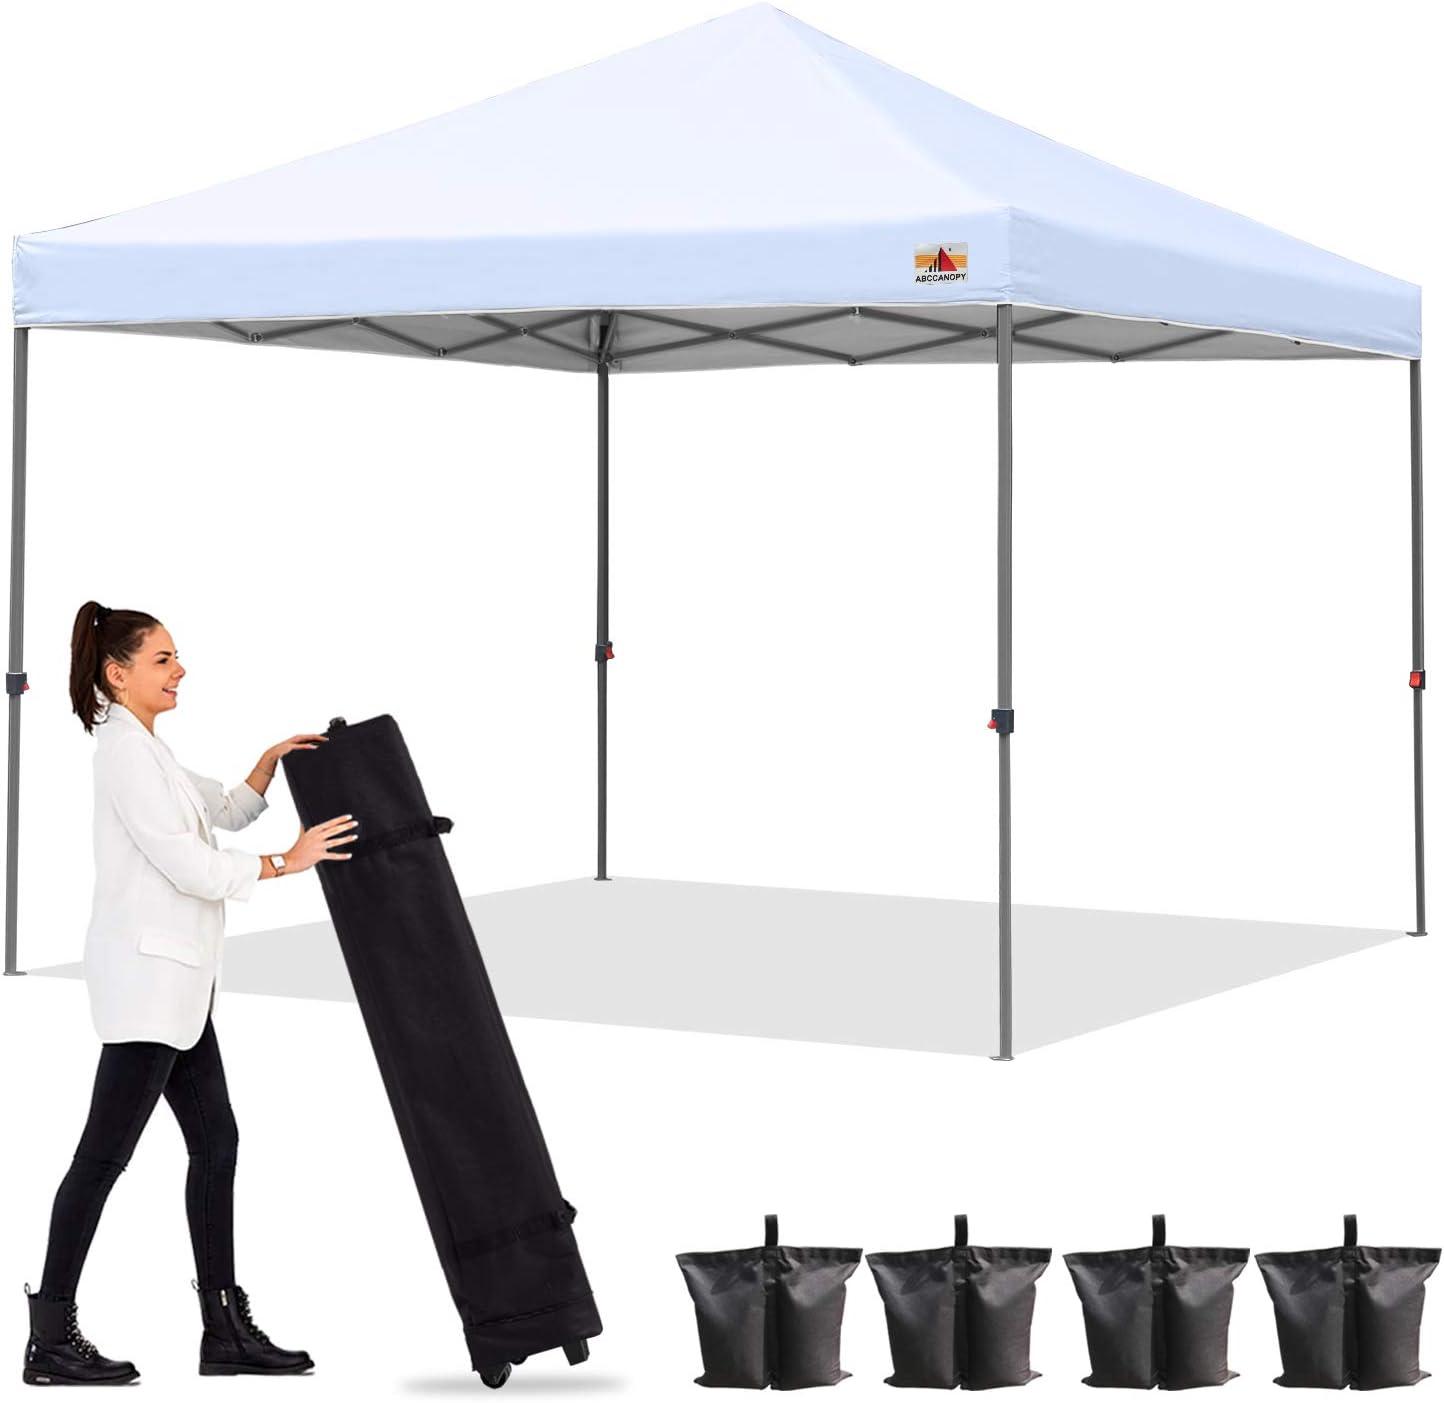 ABCCANOPY 6X6 Pop-Up Canopy Tent Sun Protection Comapct and Lightweight Beach Canopy Slant Leg Backpack Canopy,Grey